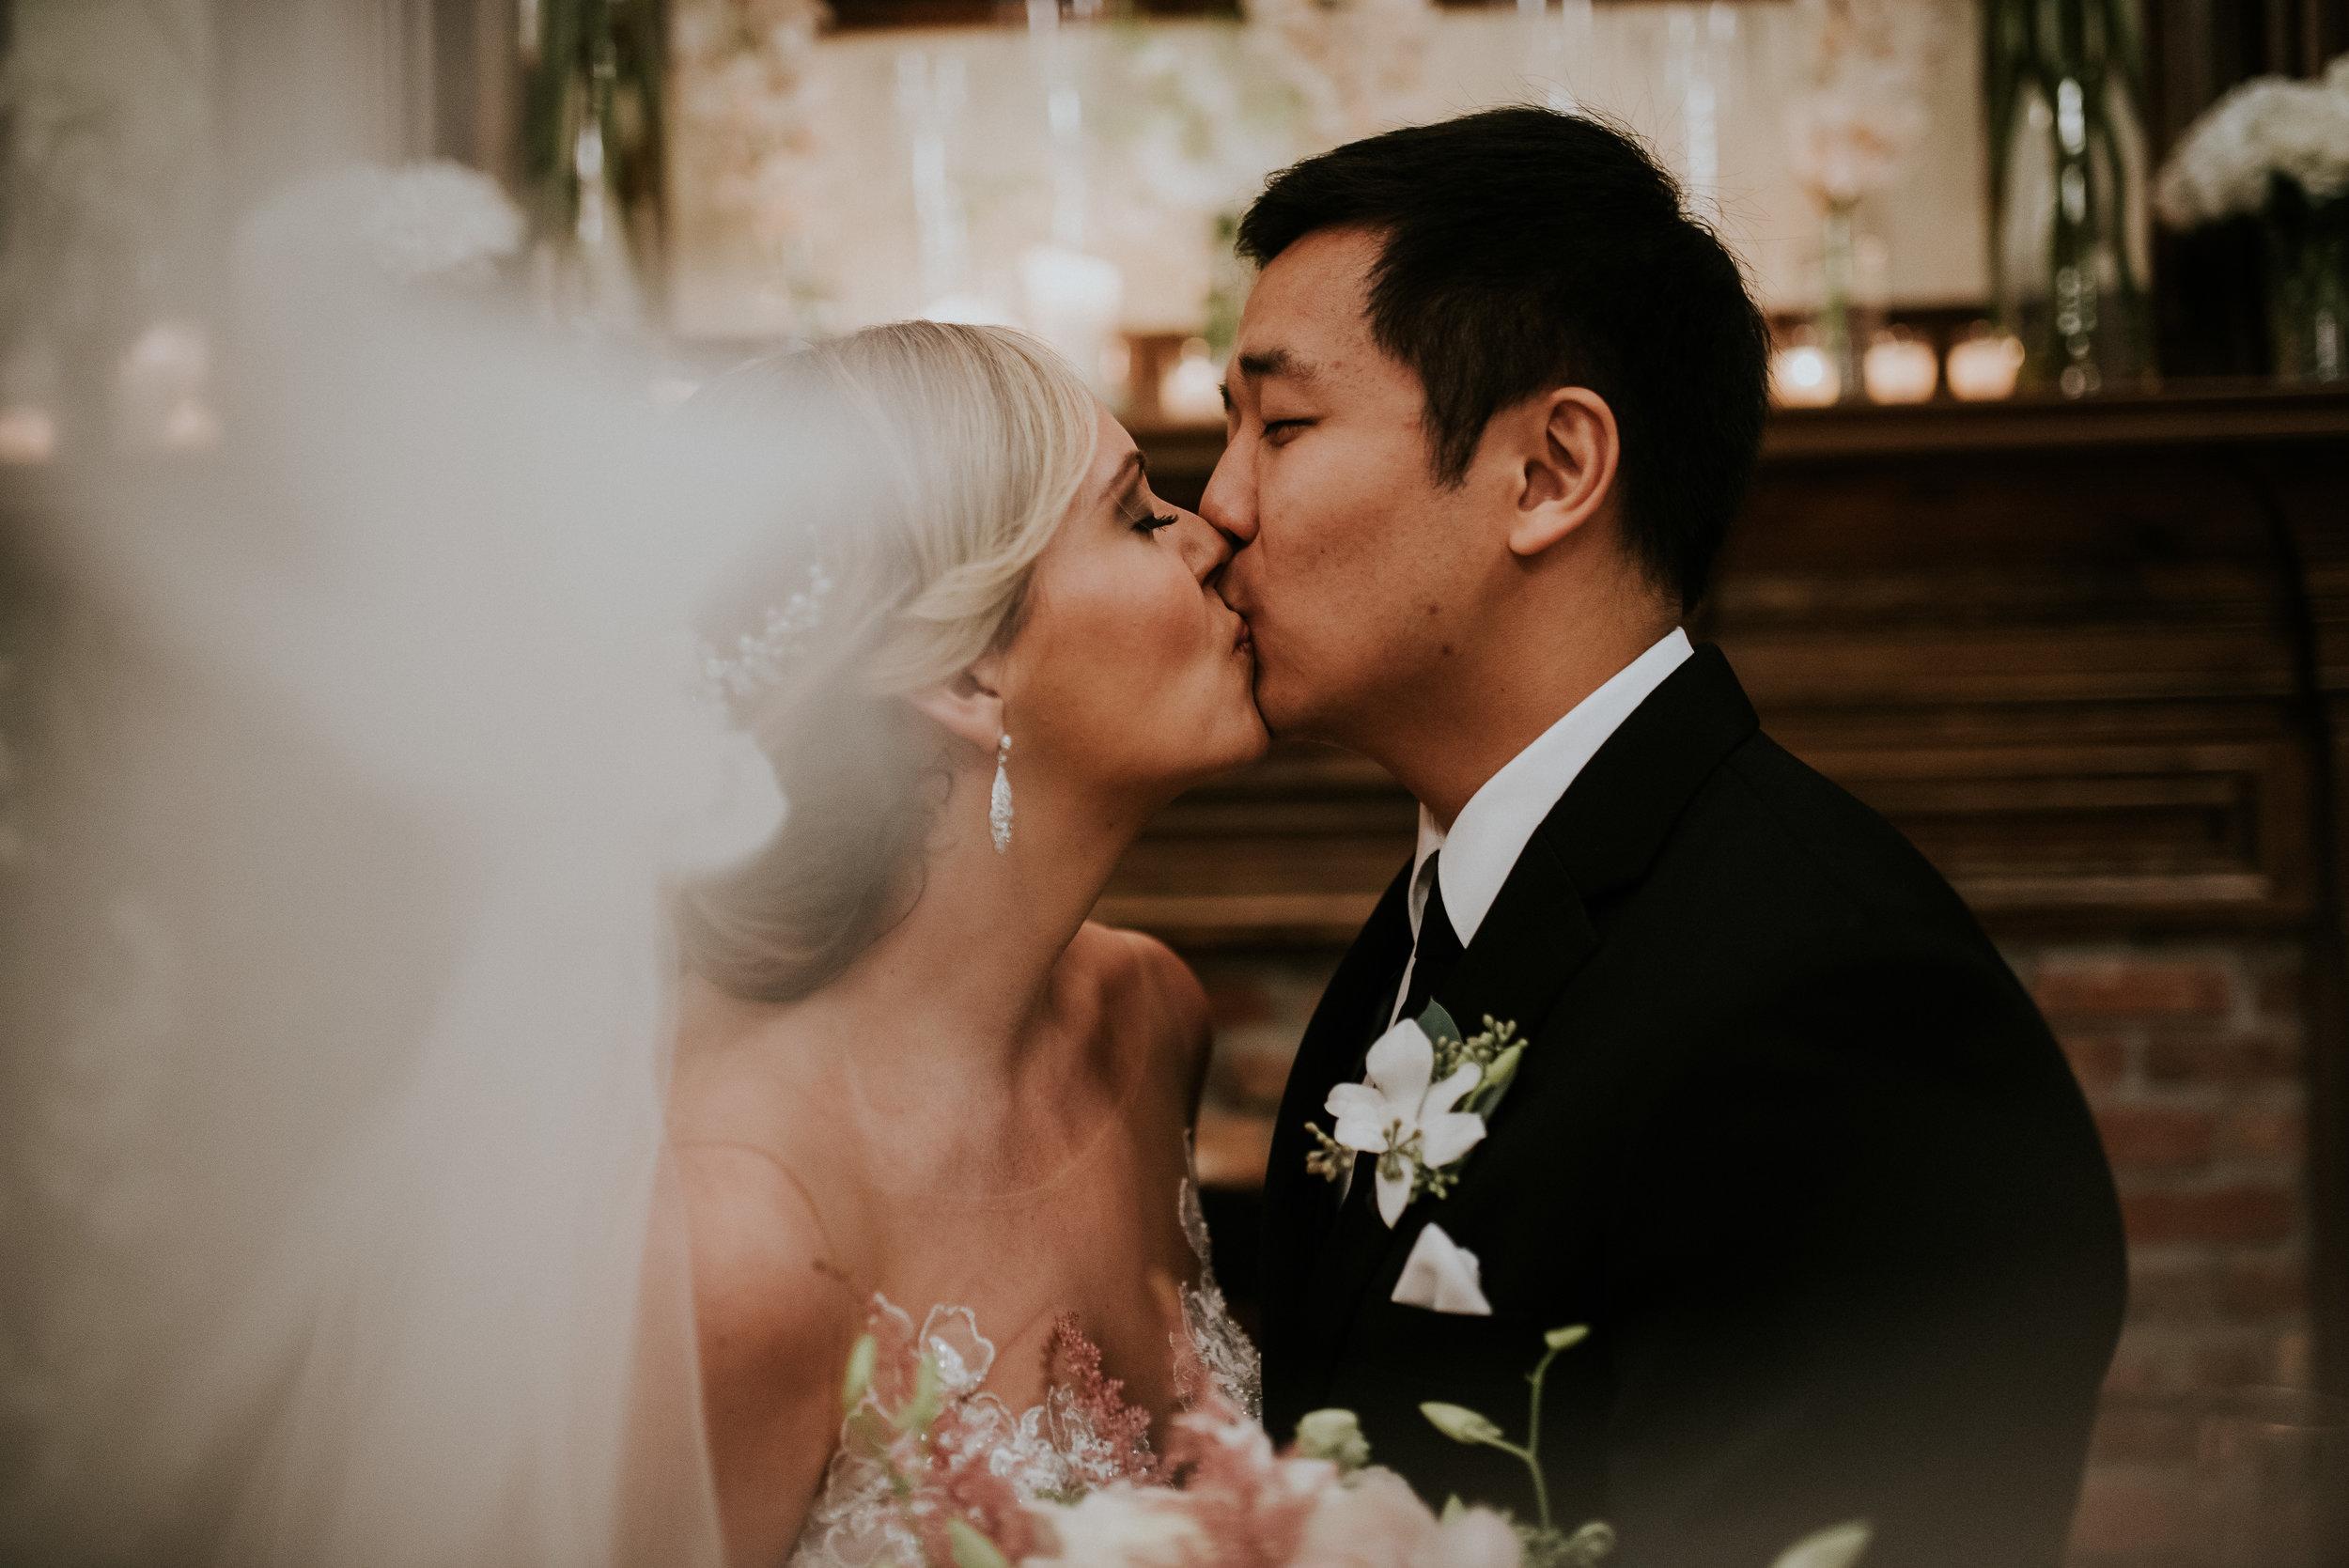 Bride and groom kissing through the veil at The Carl House in Auburn, GA